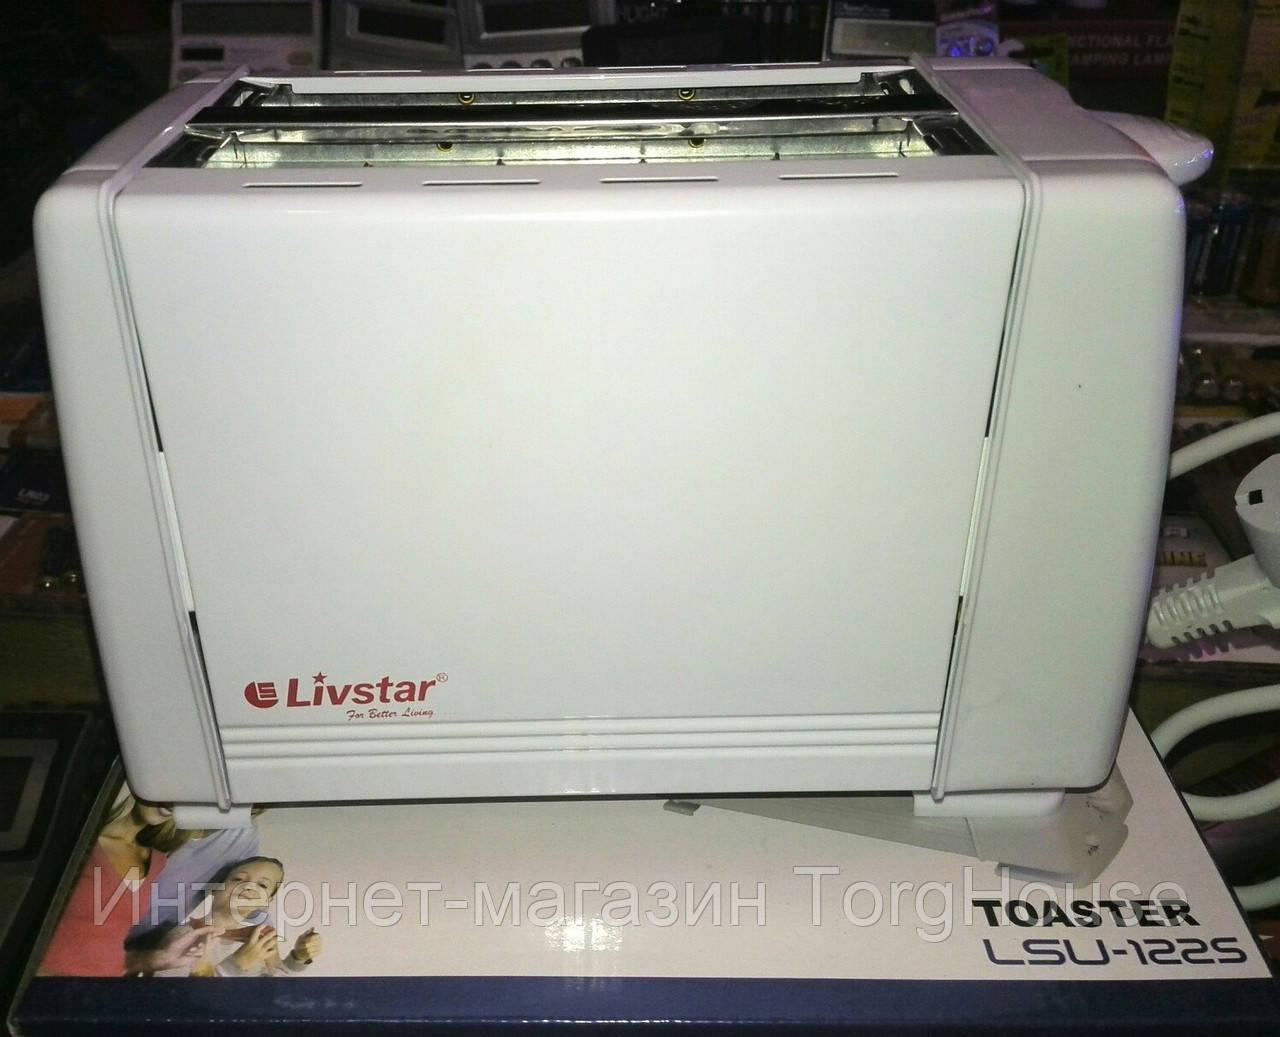 Тостер металлический LIVSTAR LSU-1225